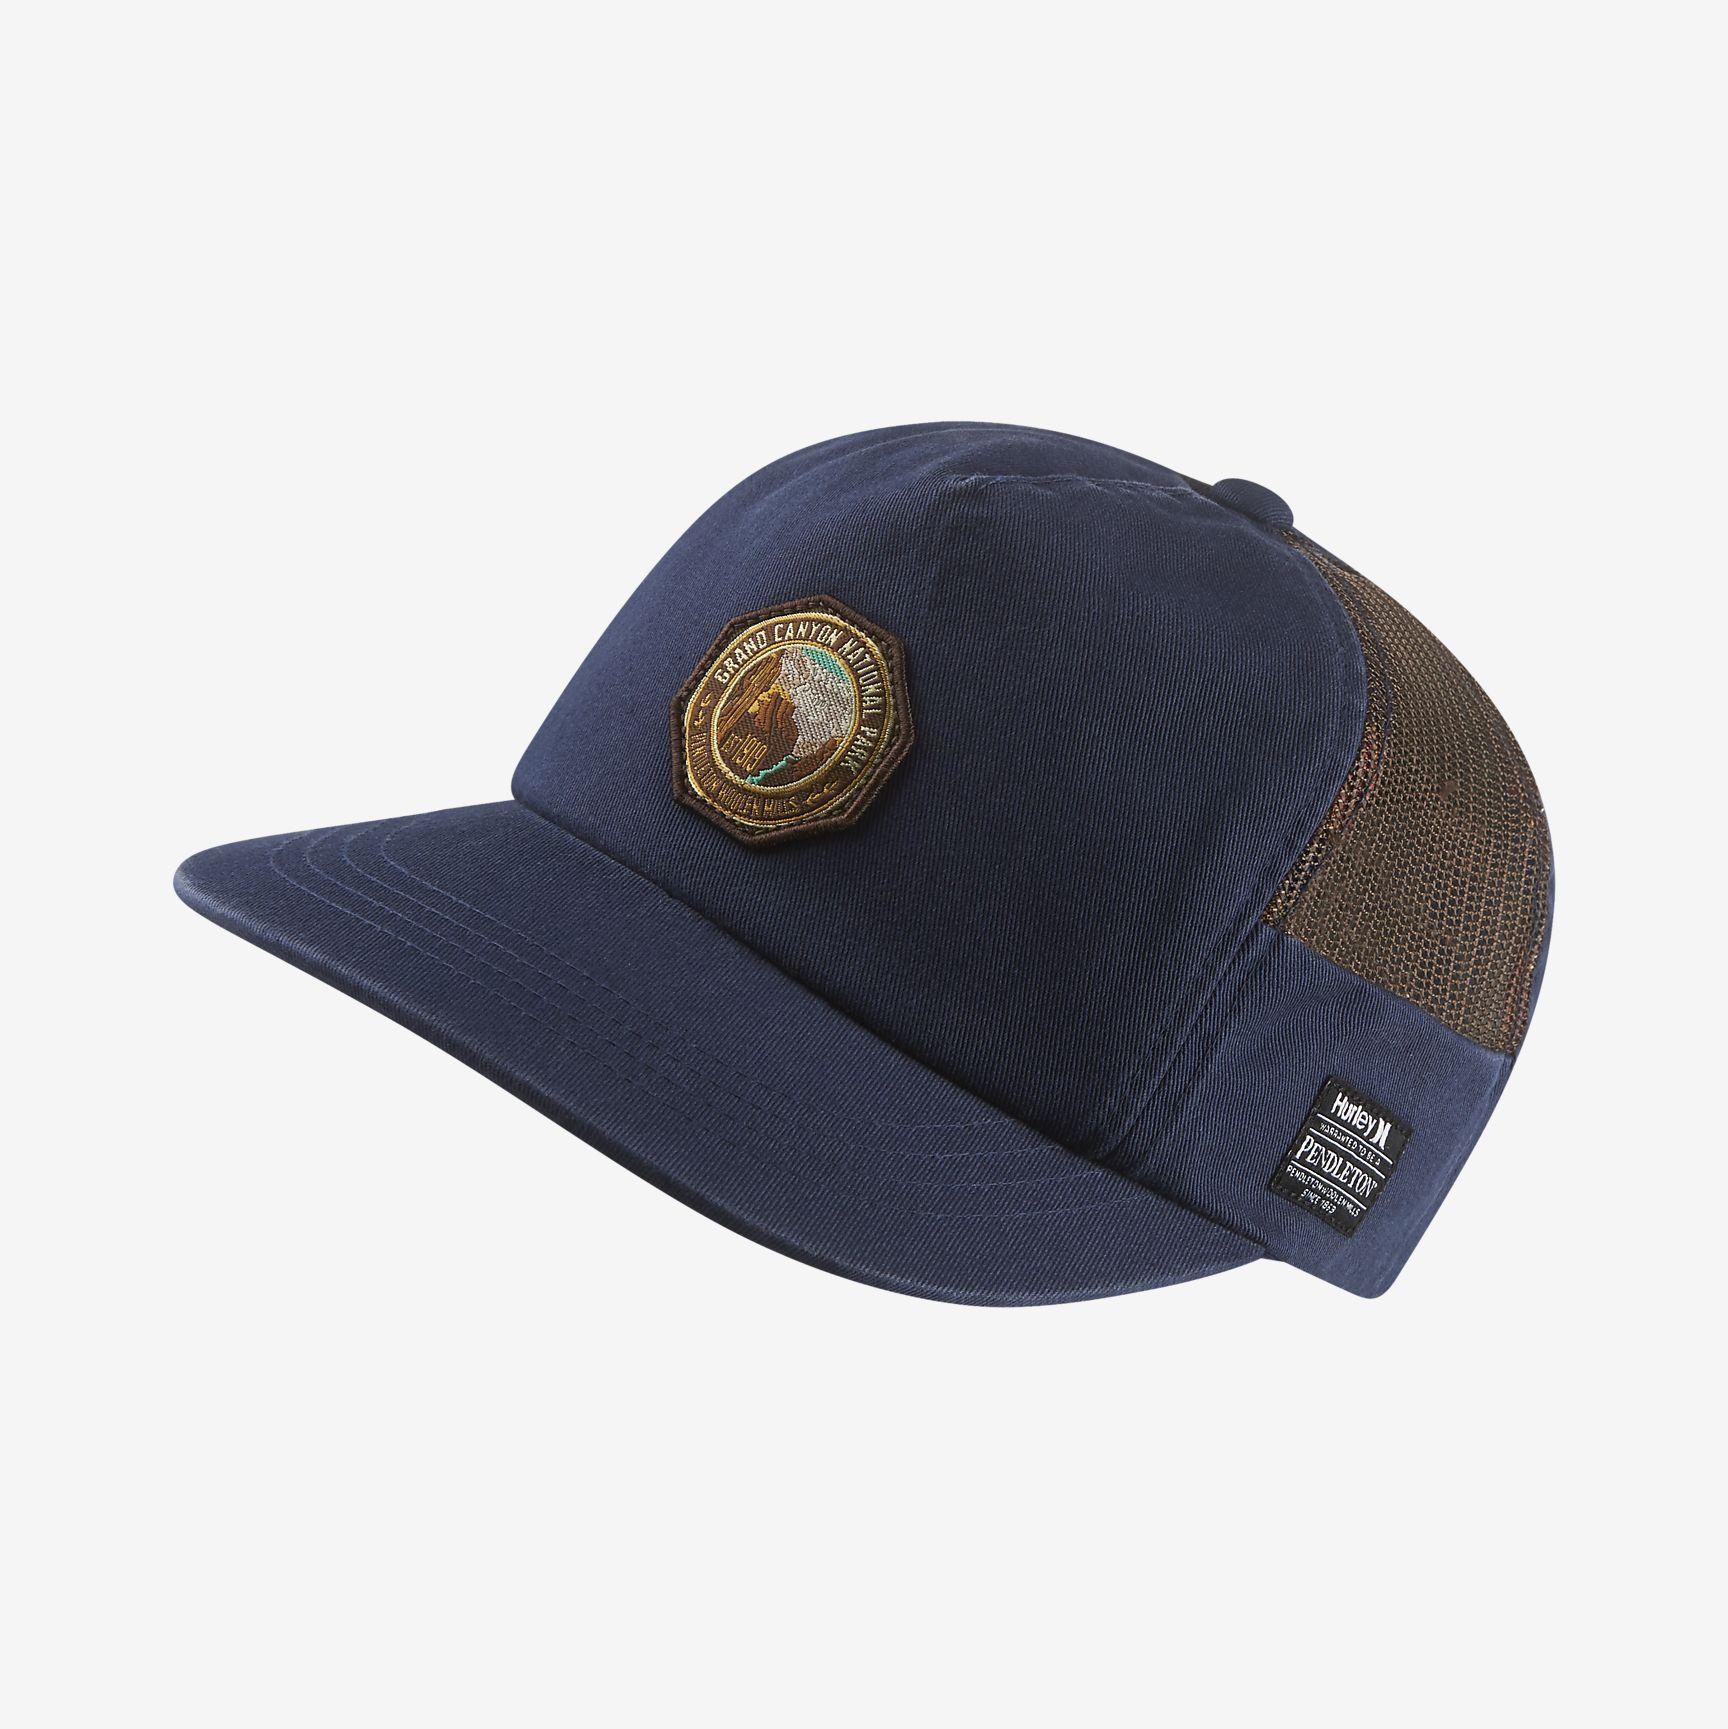 separation shoes c460c 3e071 Hurley Pendleton Grand Canyon Men s Adjustable Hat